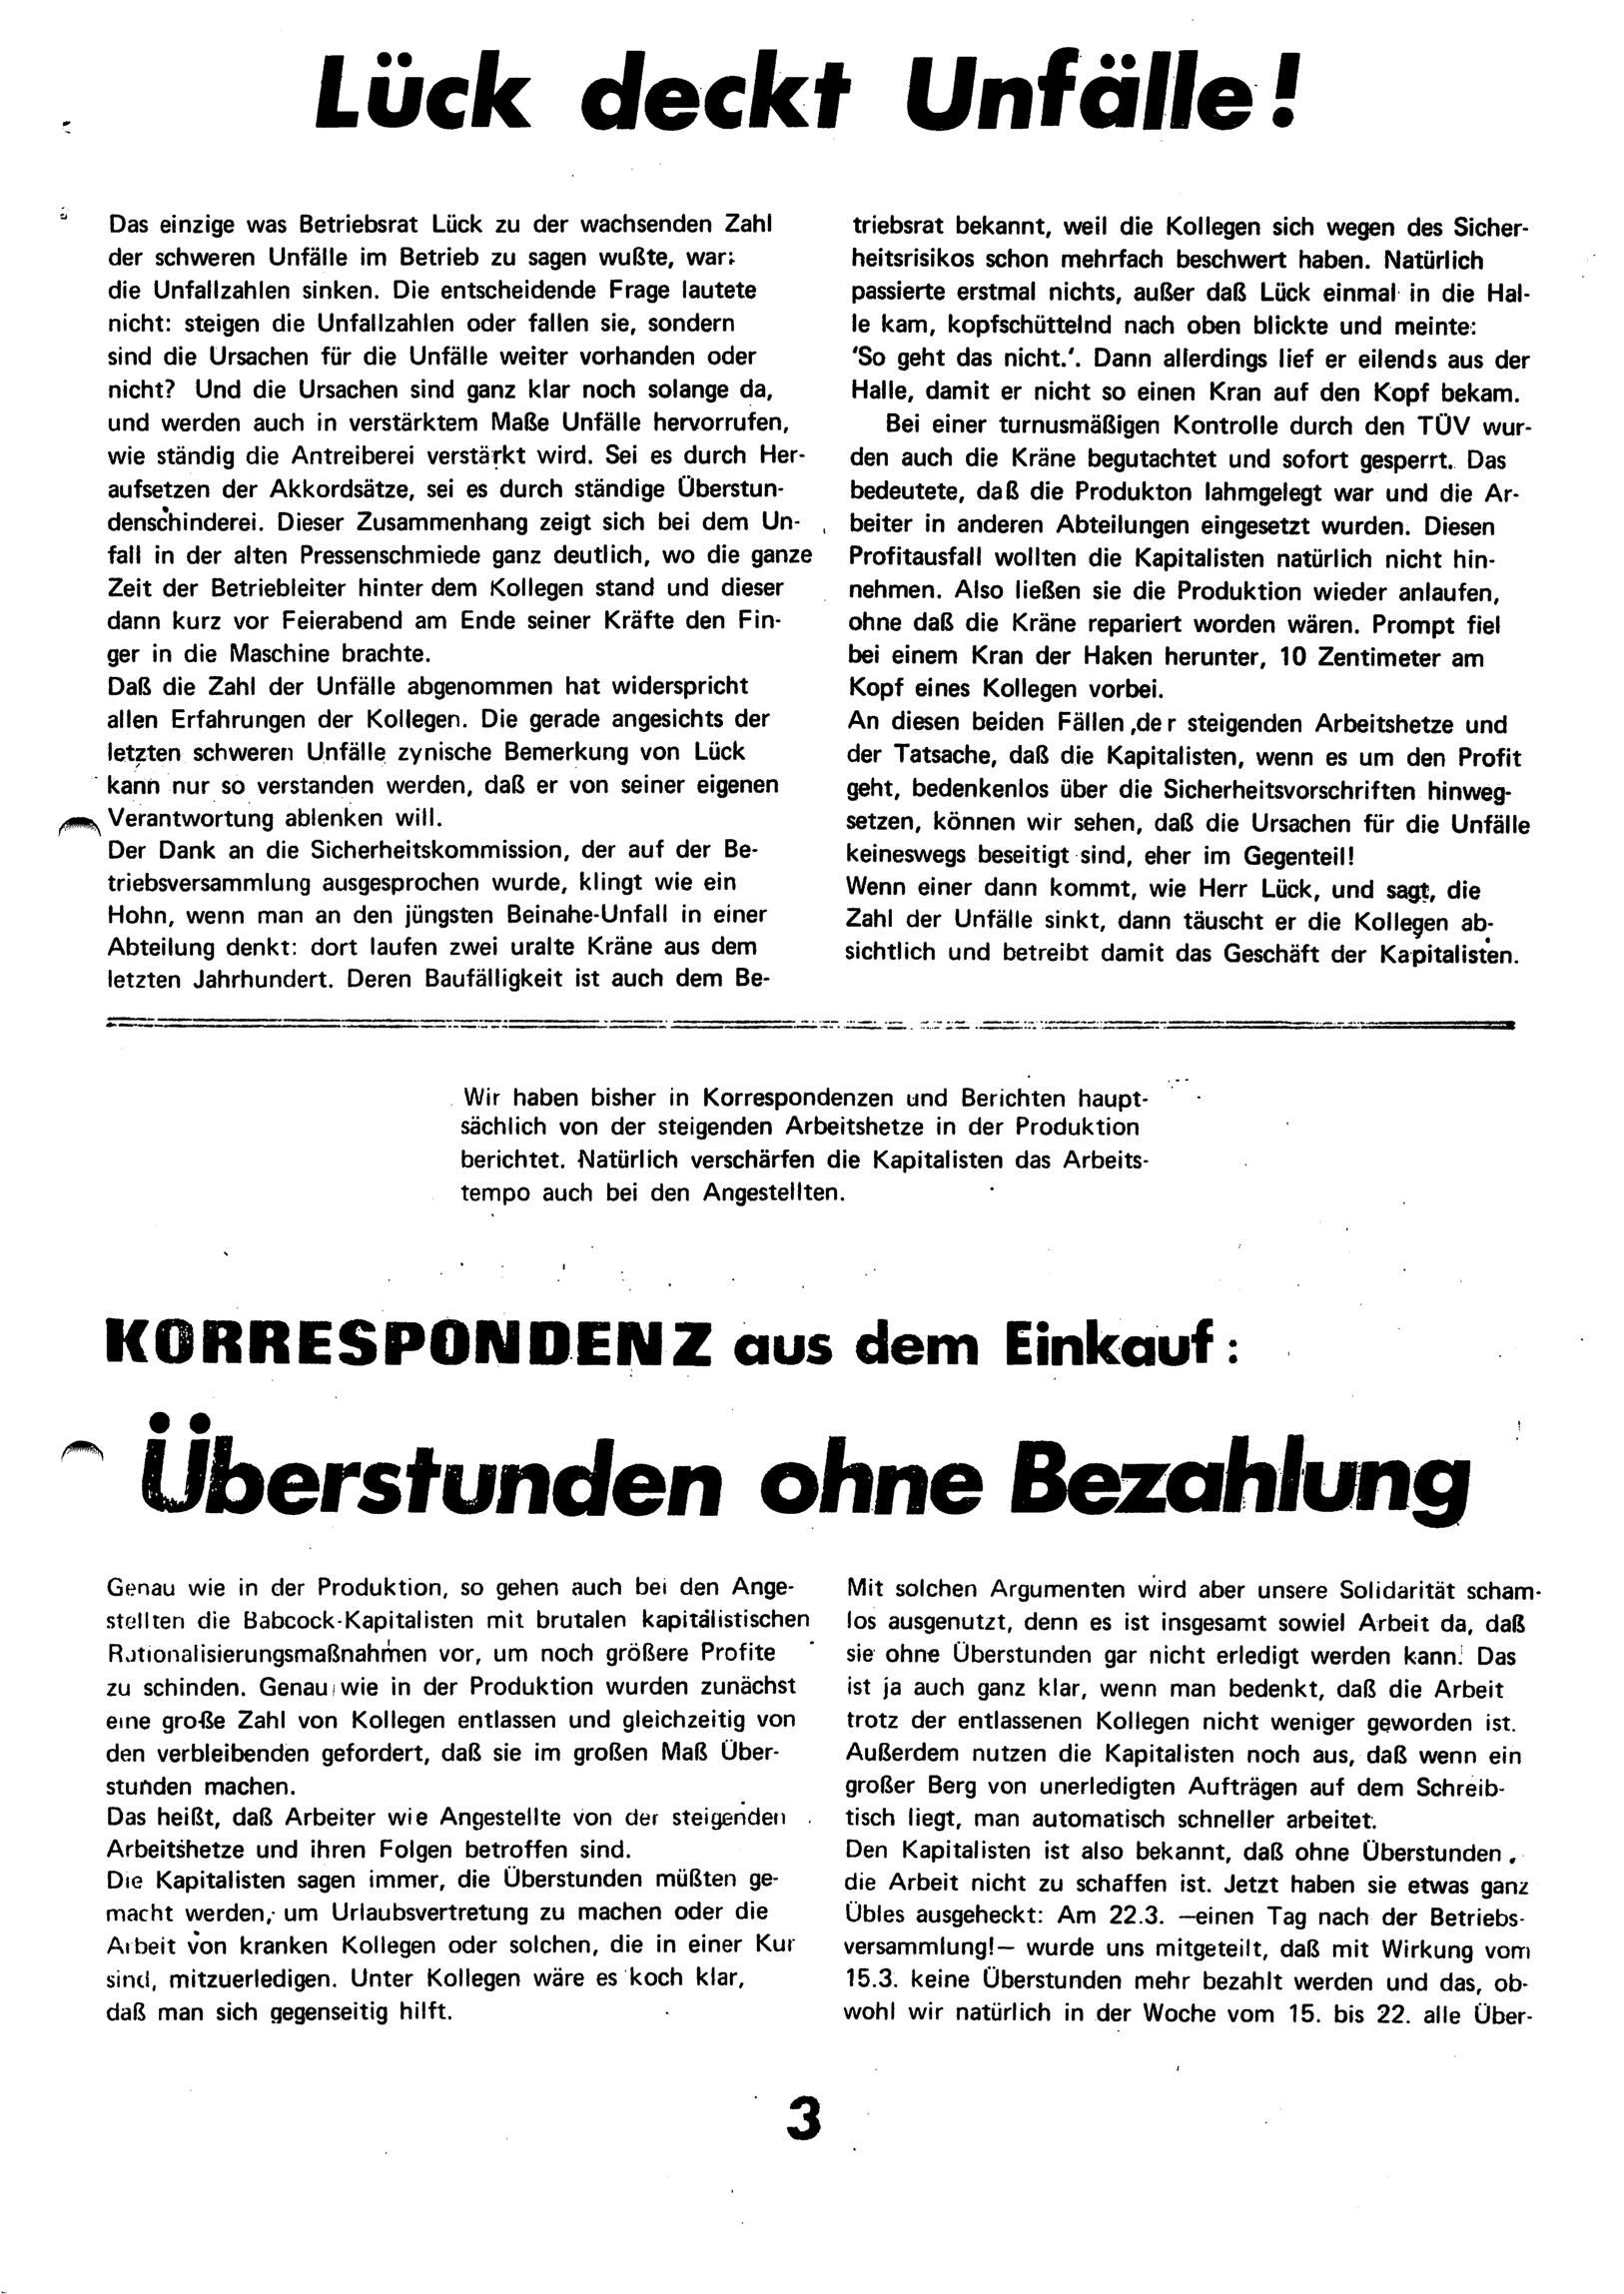 Berlin_Borsig336